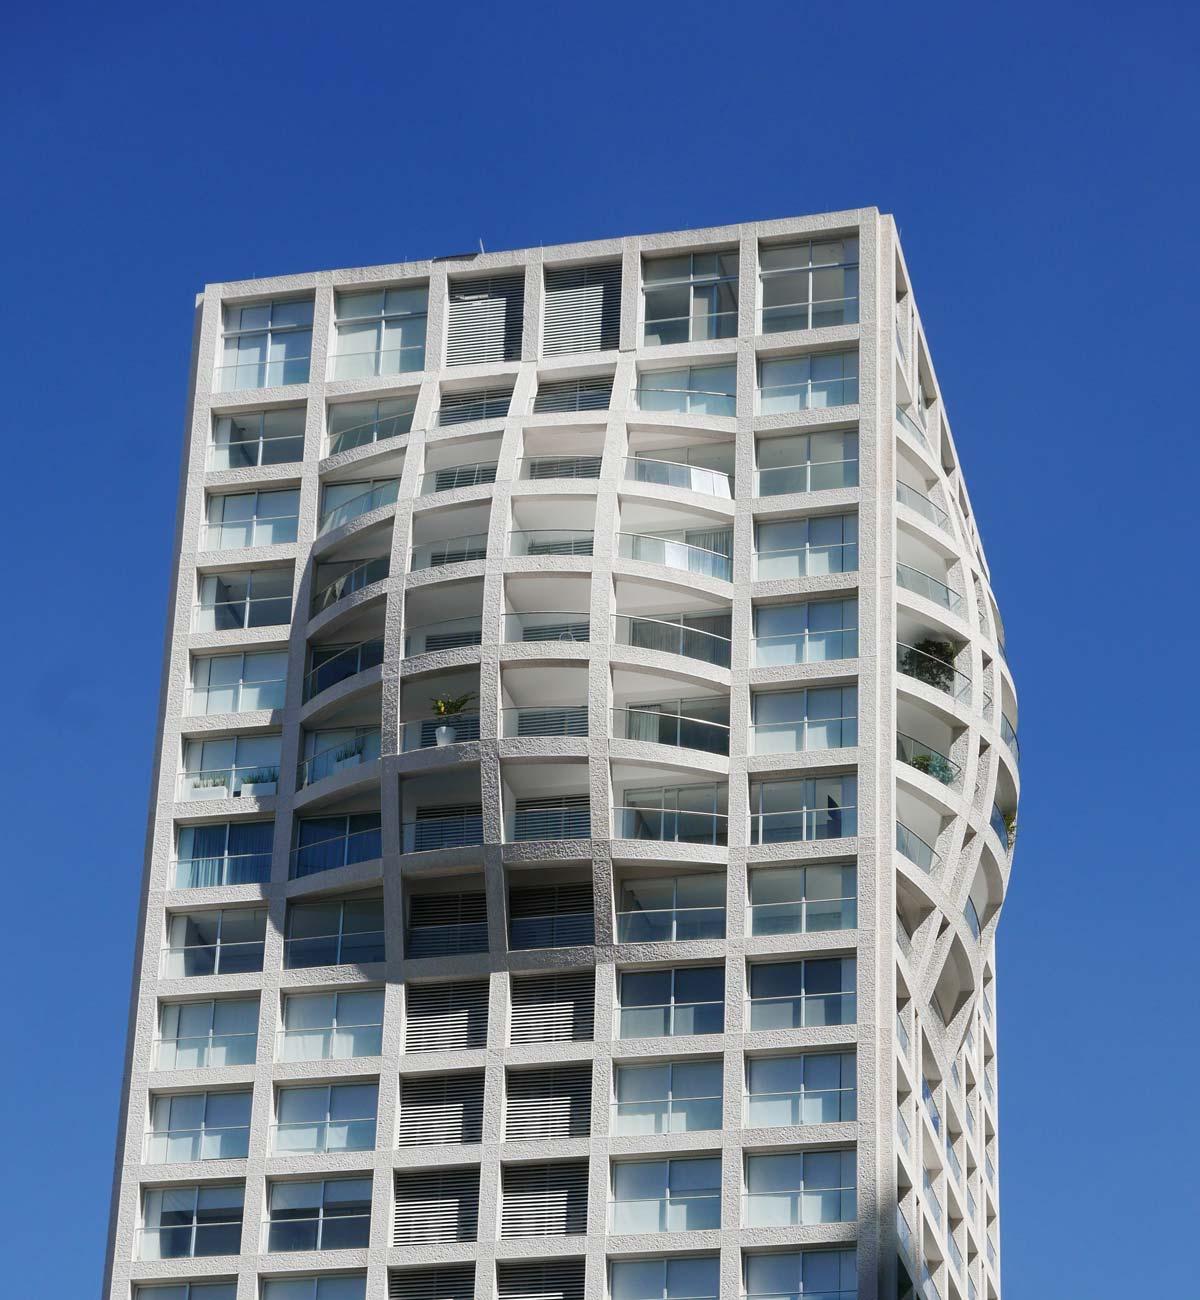 Nice architecture: apartment building towards the Zapopan district in Guadalajara